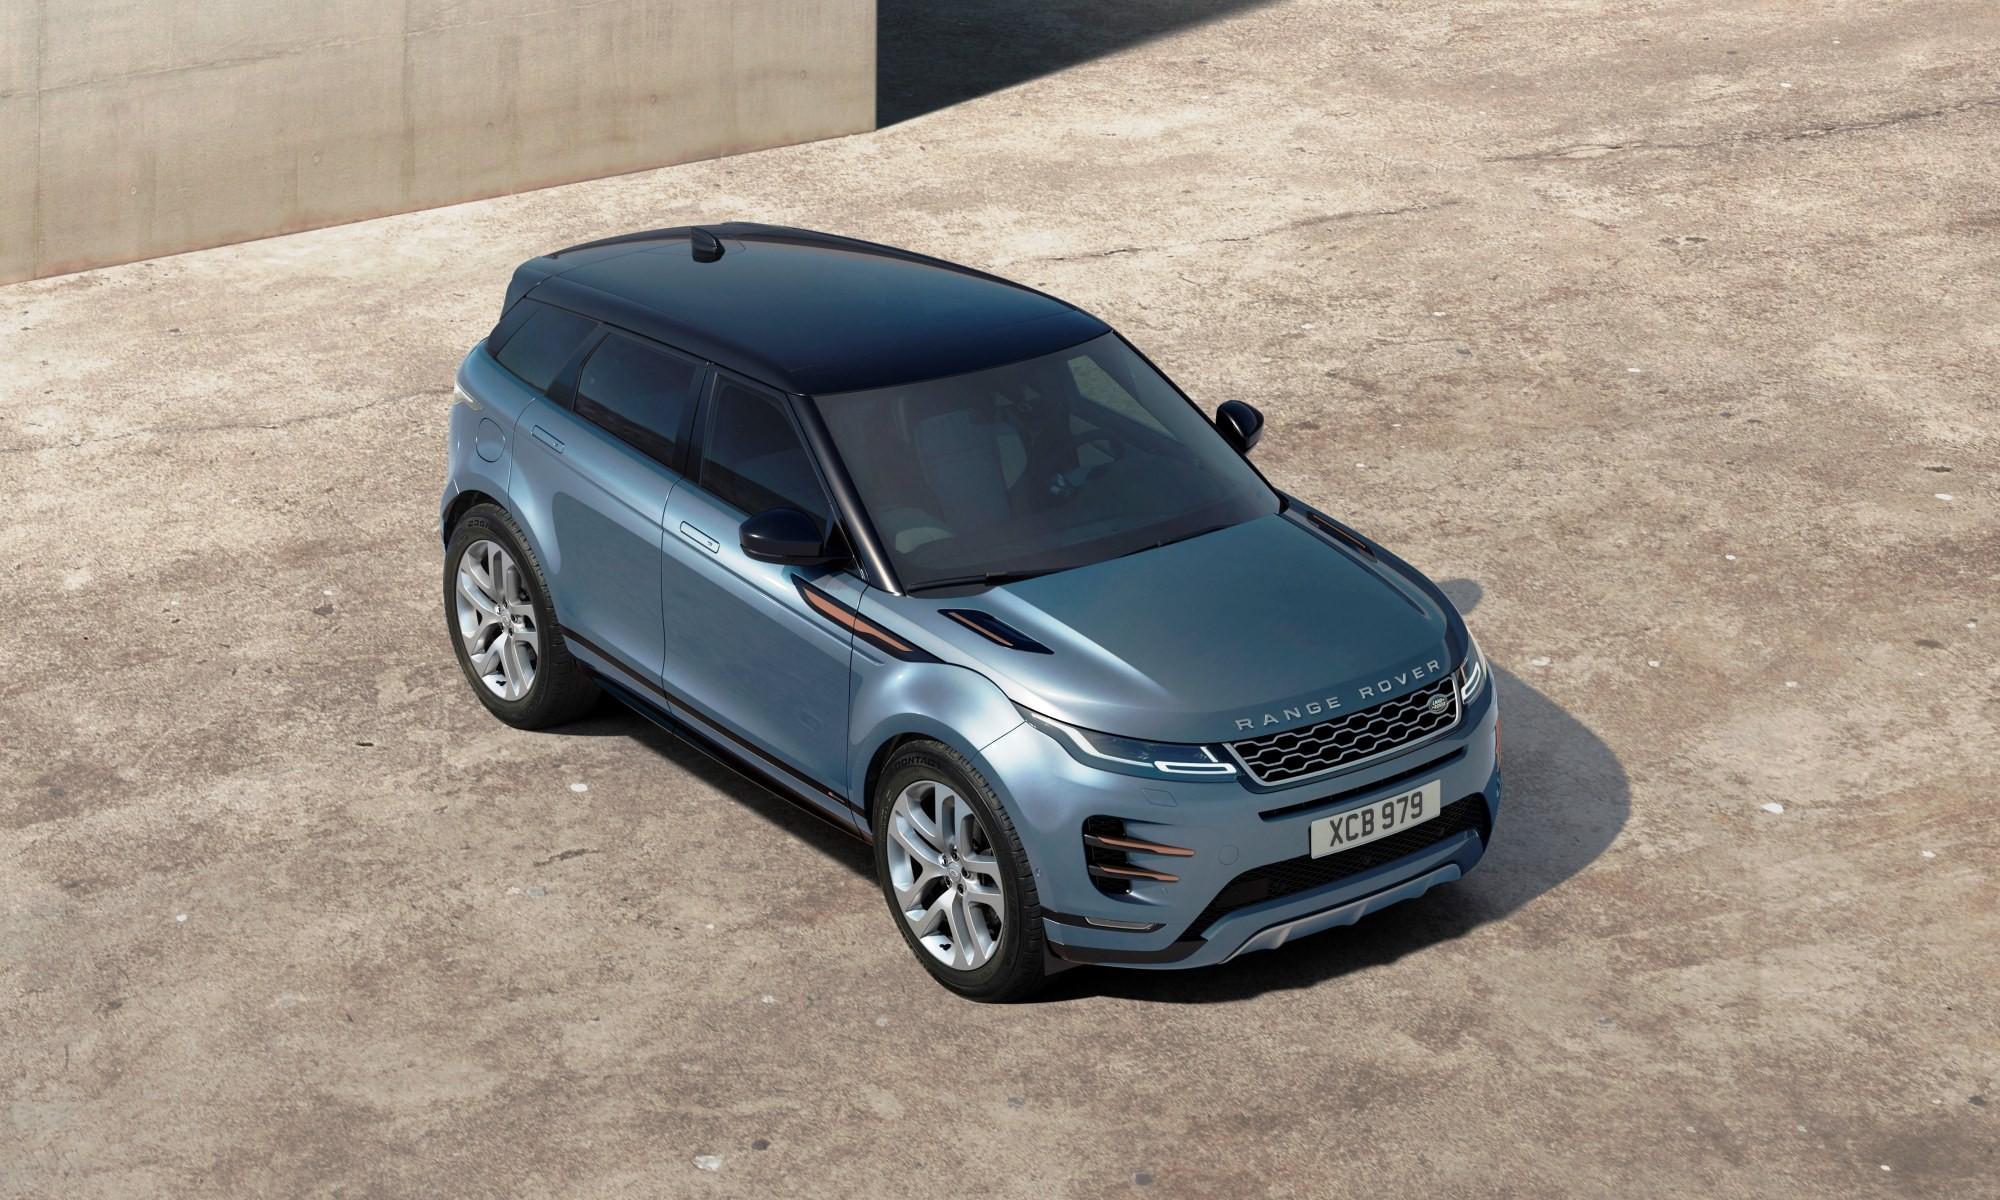 New Range Rover Evoque top